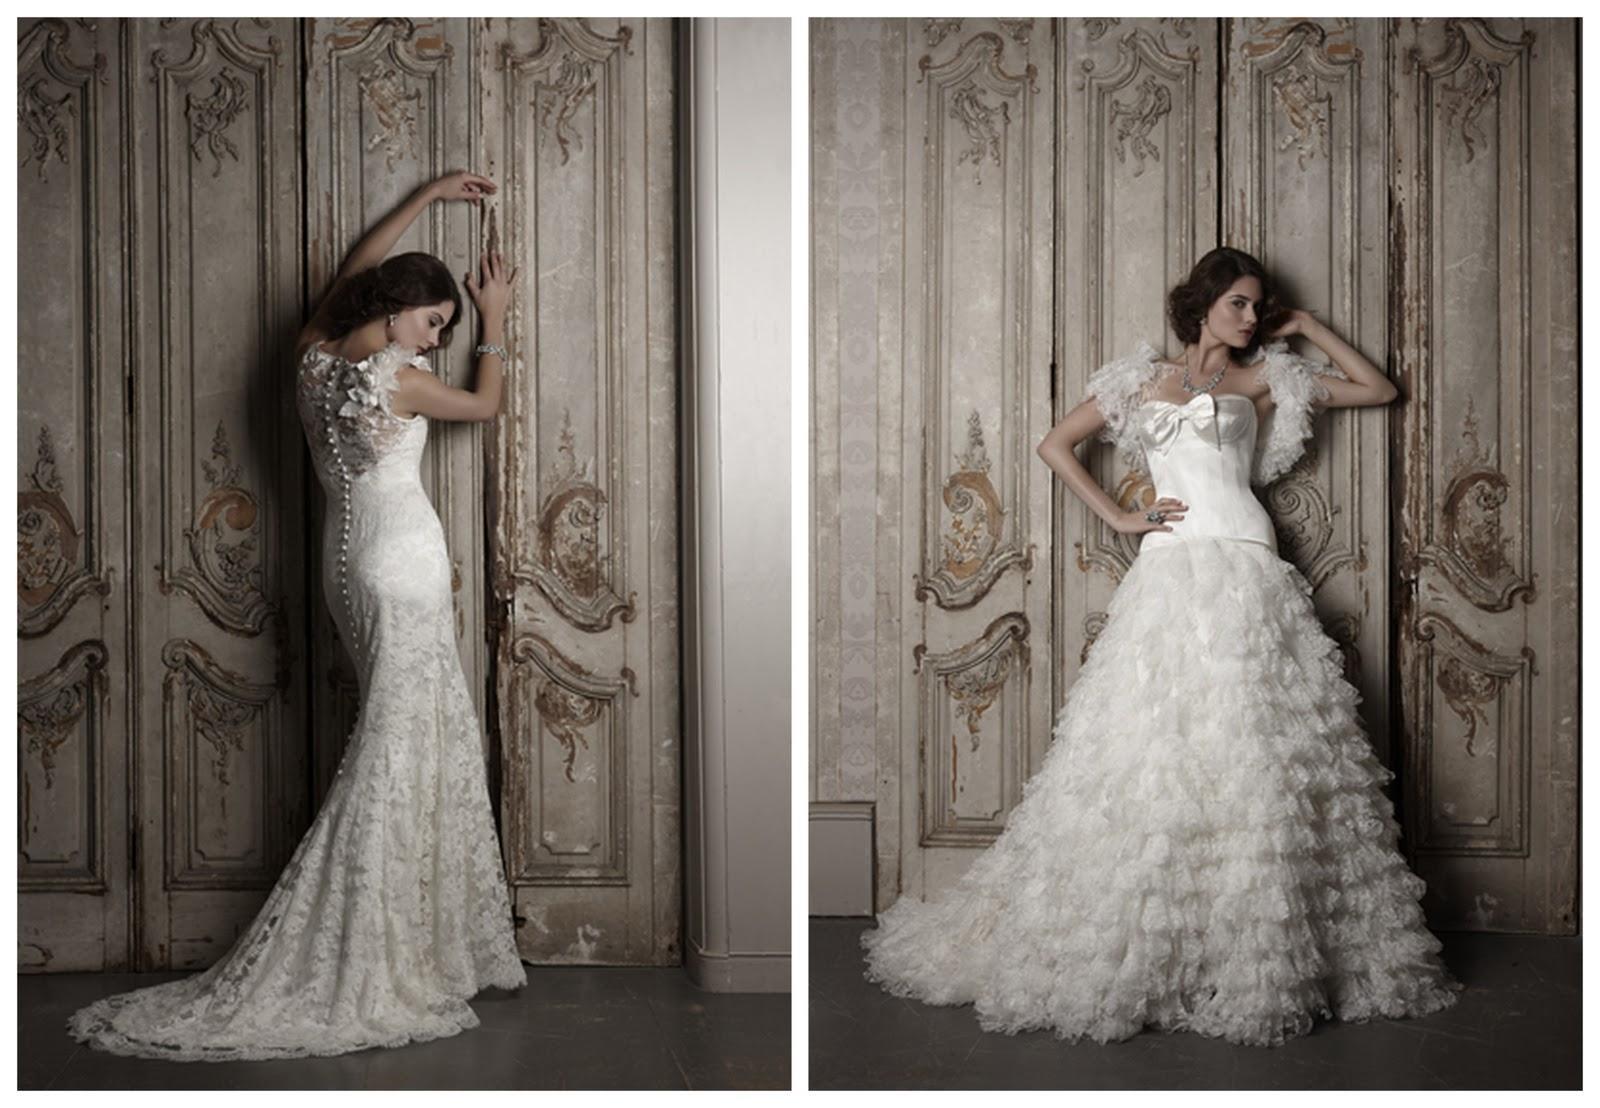 wedding dresses and